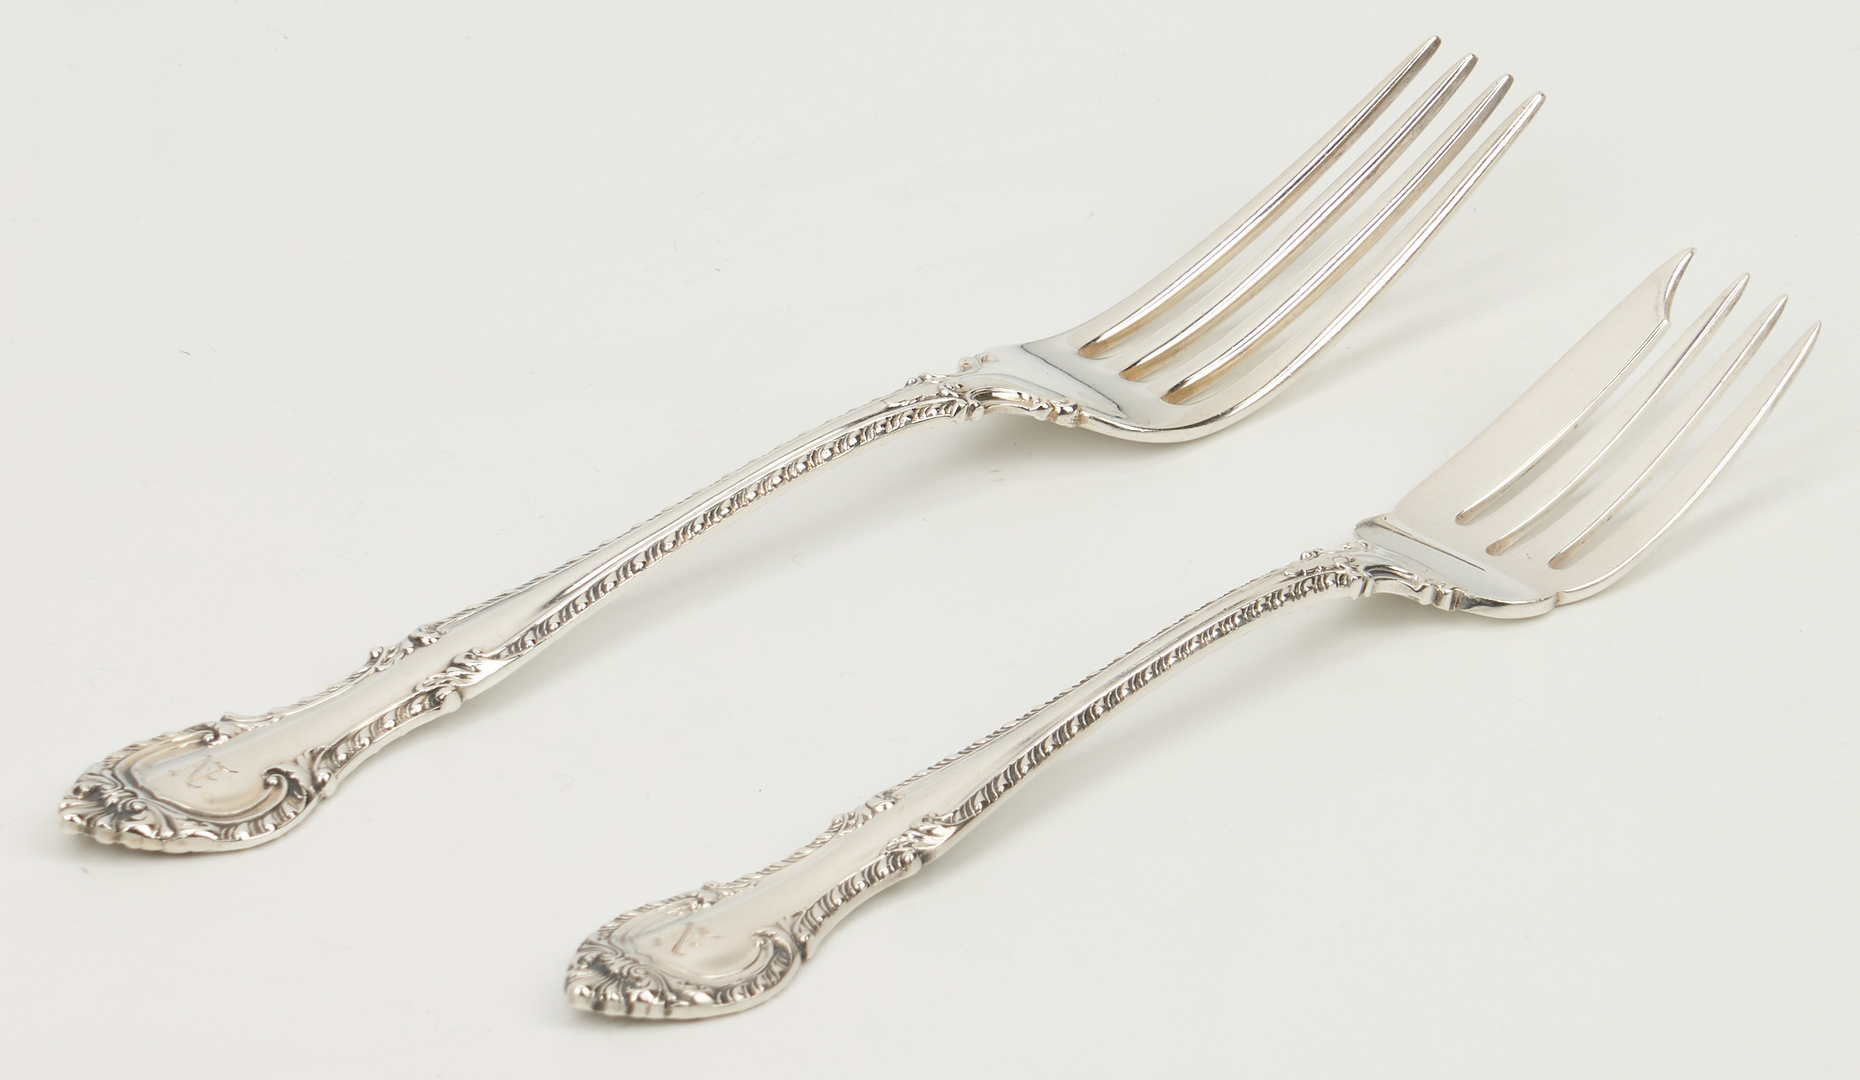 Lot 237: 84 Pcs. Sterling Silver, incl. Gorham English Gadroon Flatware